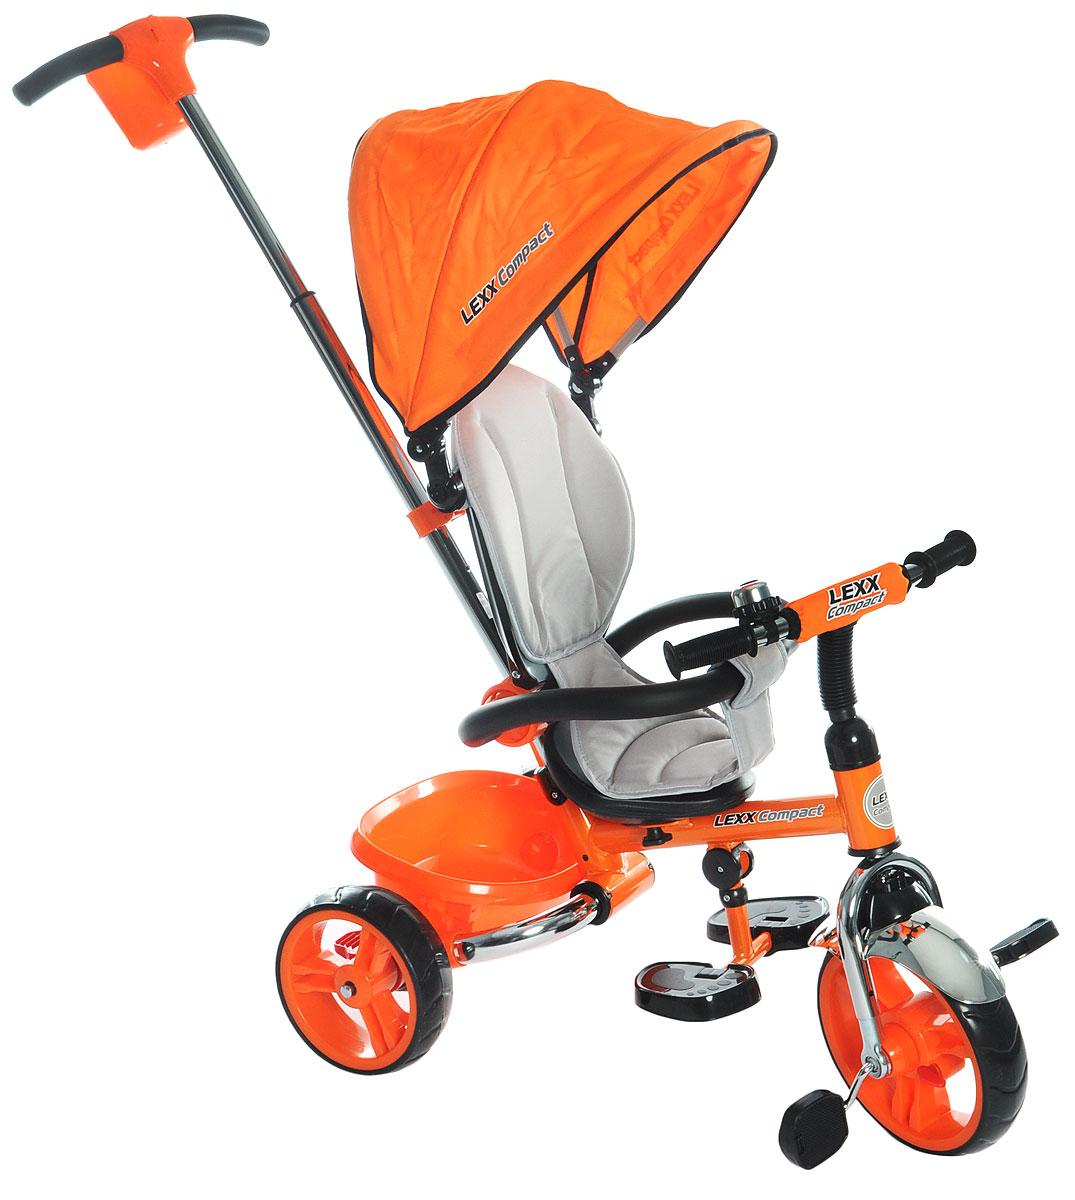 GT Велосипед-каталка GT8763 Lexx Compact цвет оранжевый -  Велосипеды-каталки